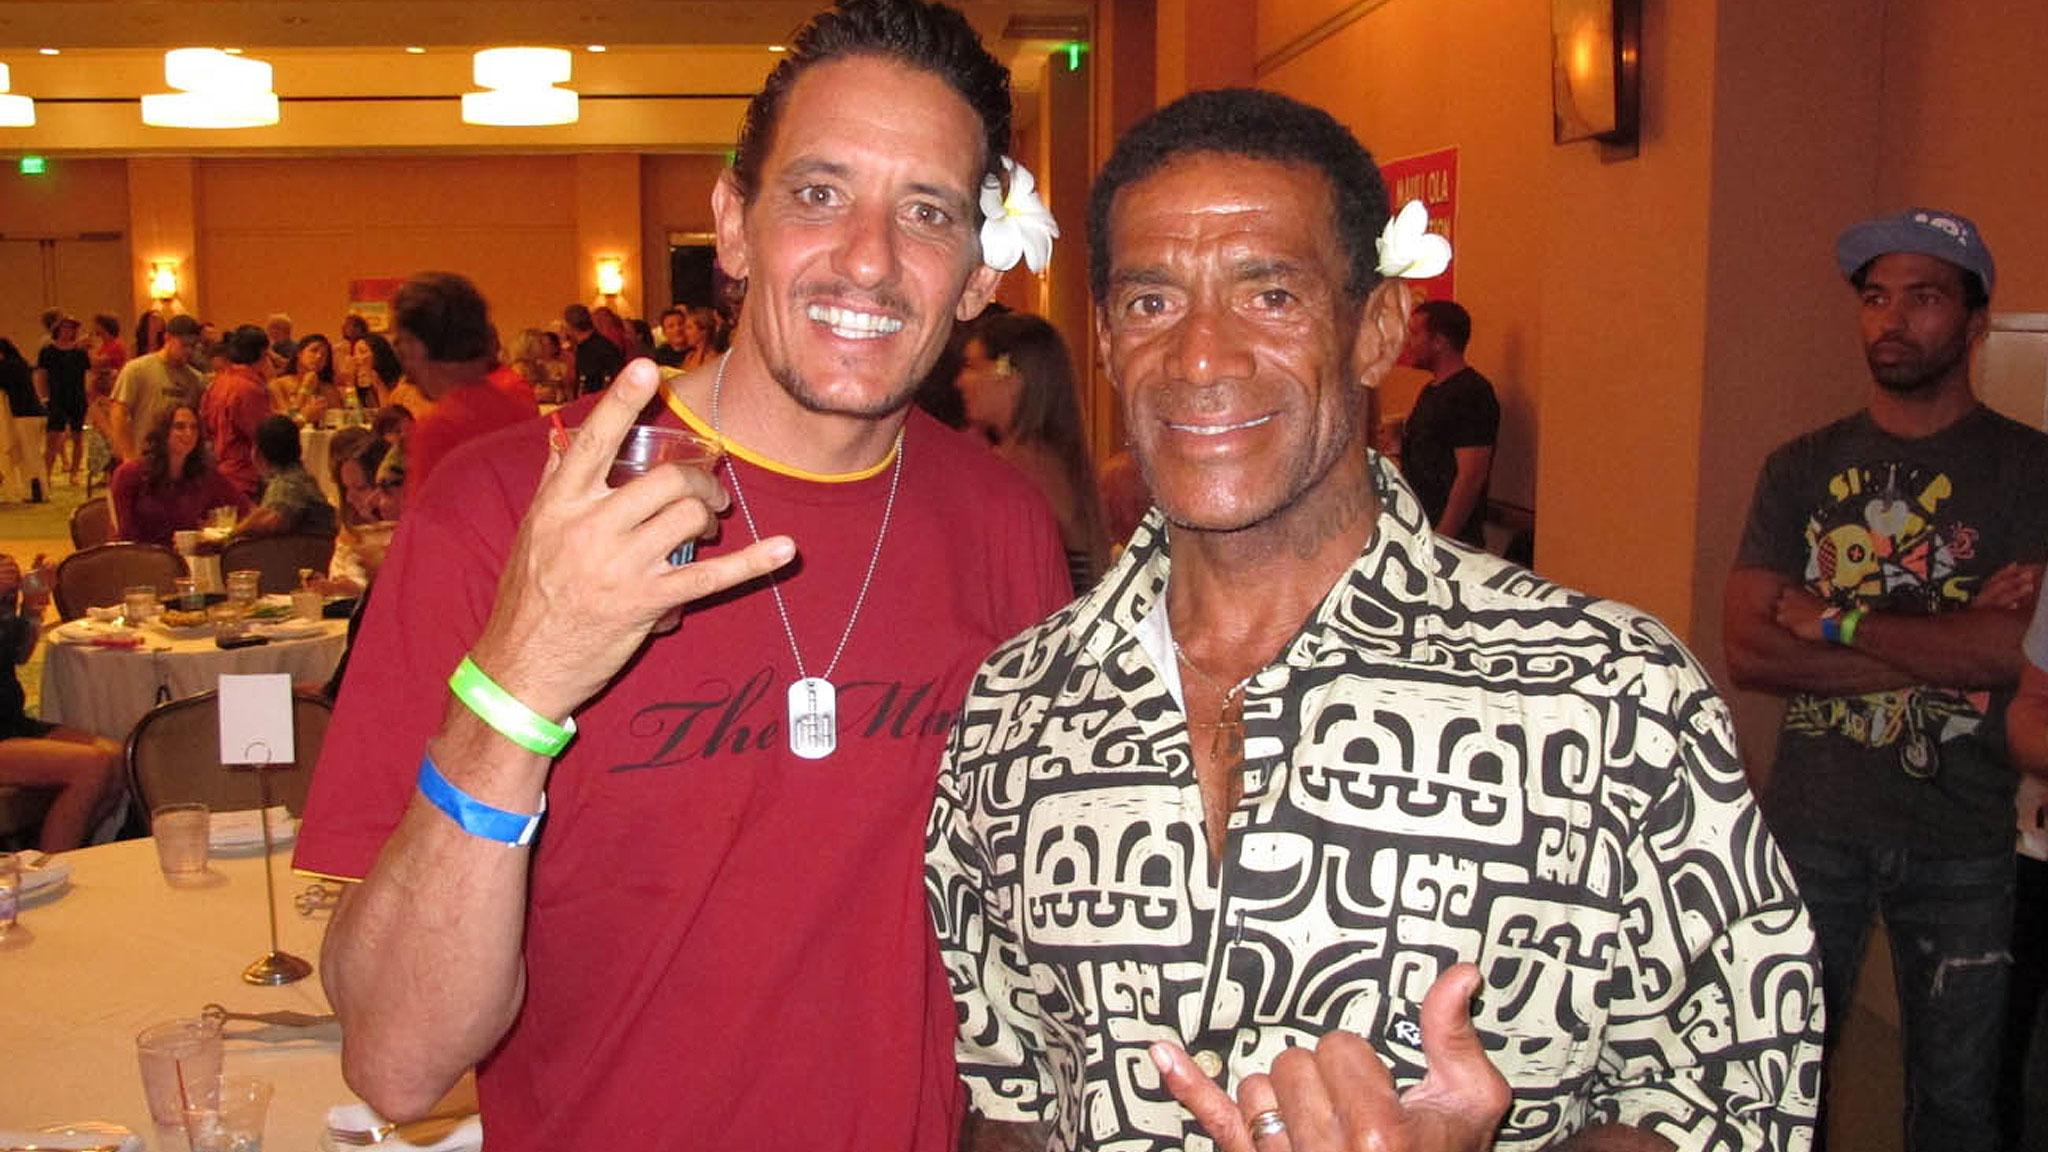 Buttons Kaluhiokalani and Mark Gabriel